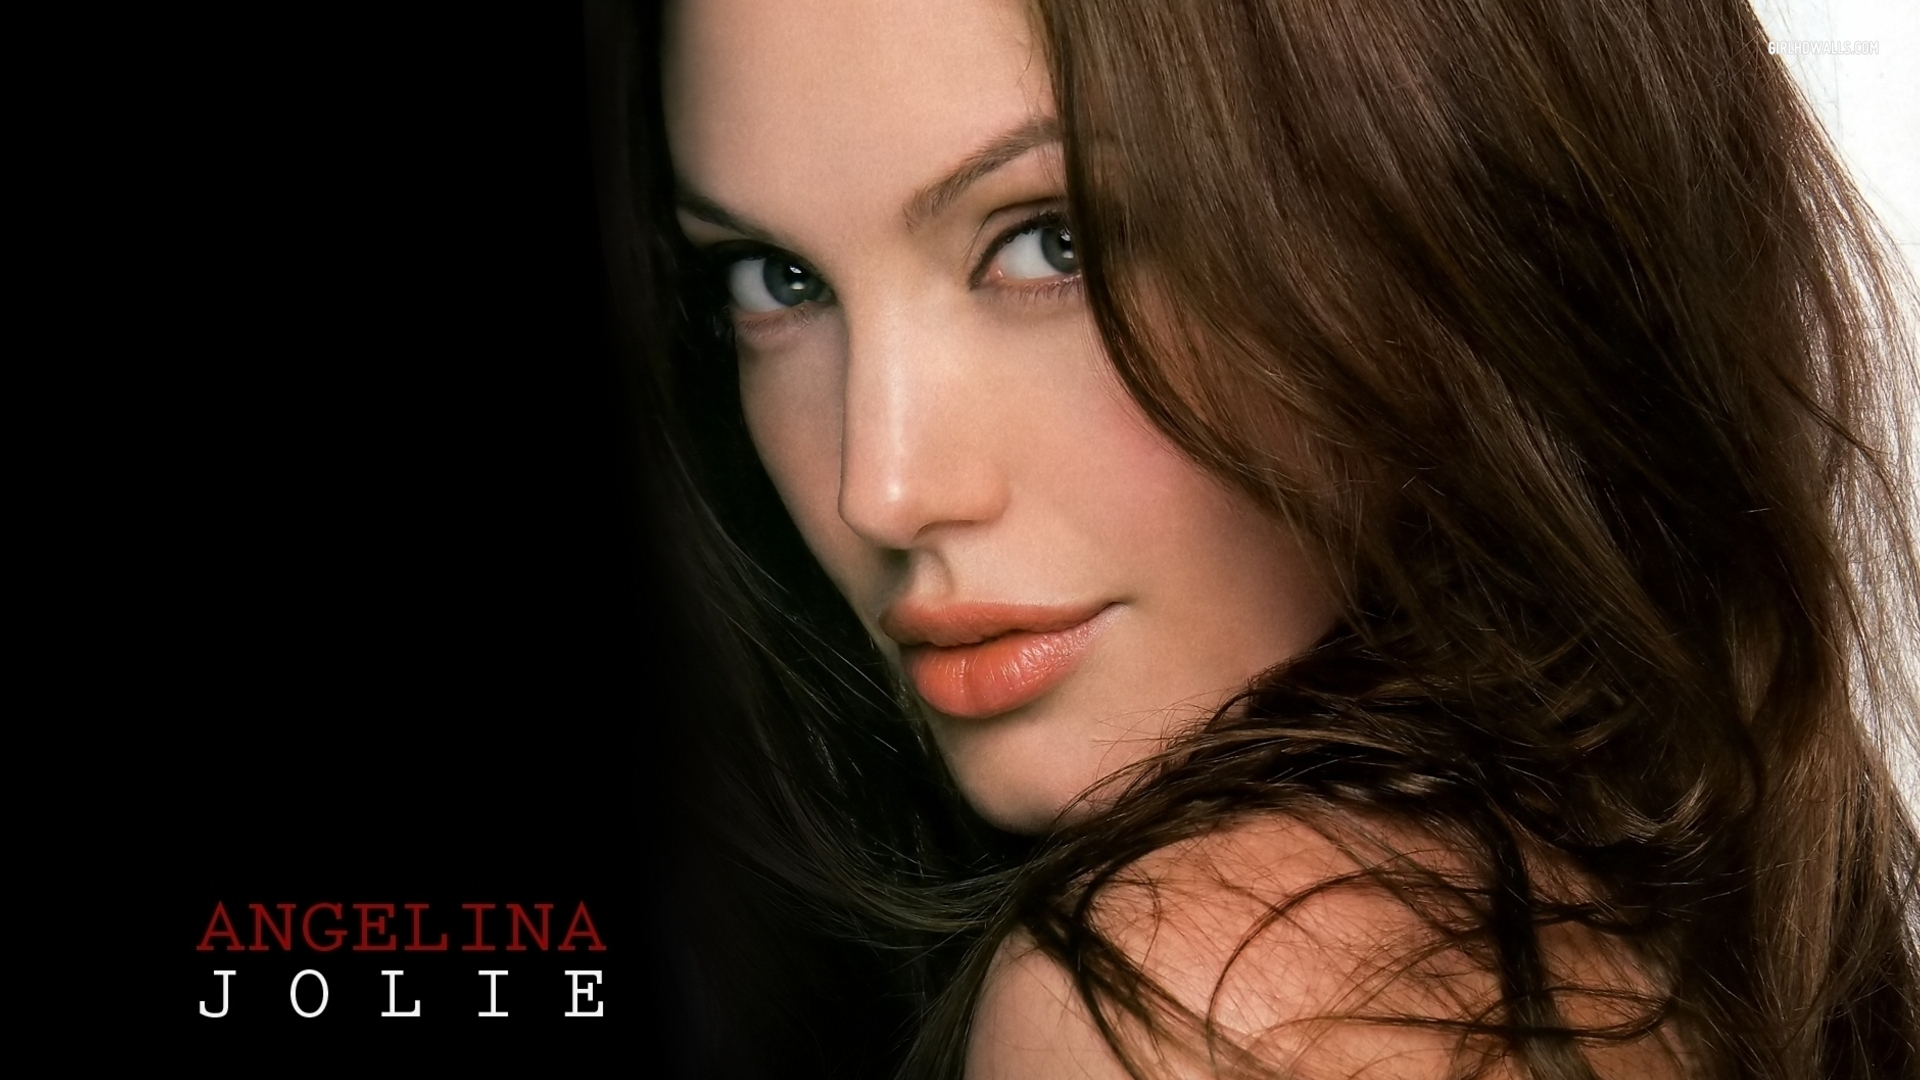 Angelina Jolie Beautiful Desktop 1080 HD Wallpaper Search more high 1920x1080